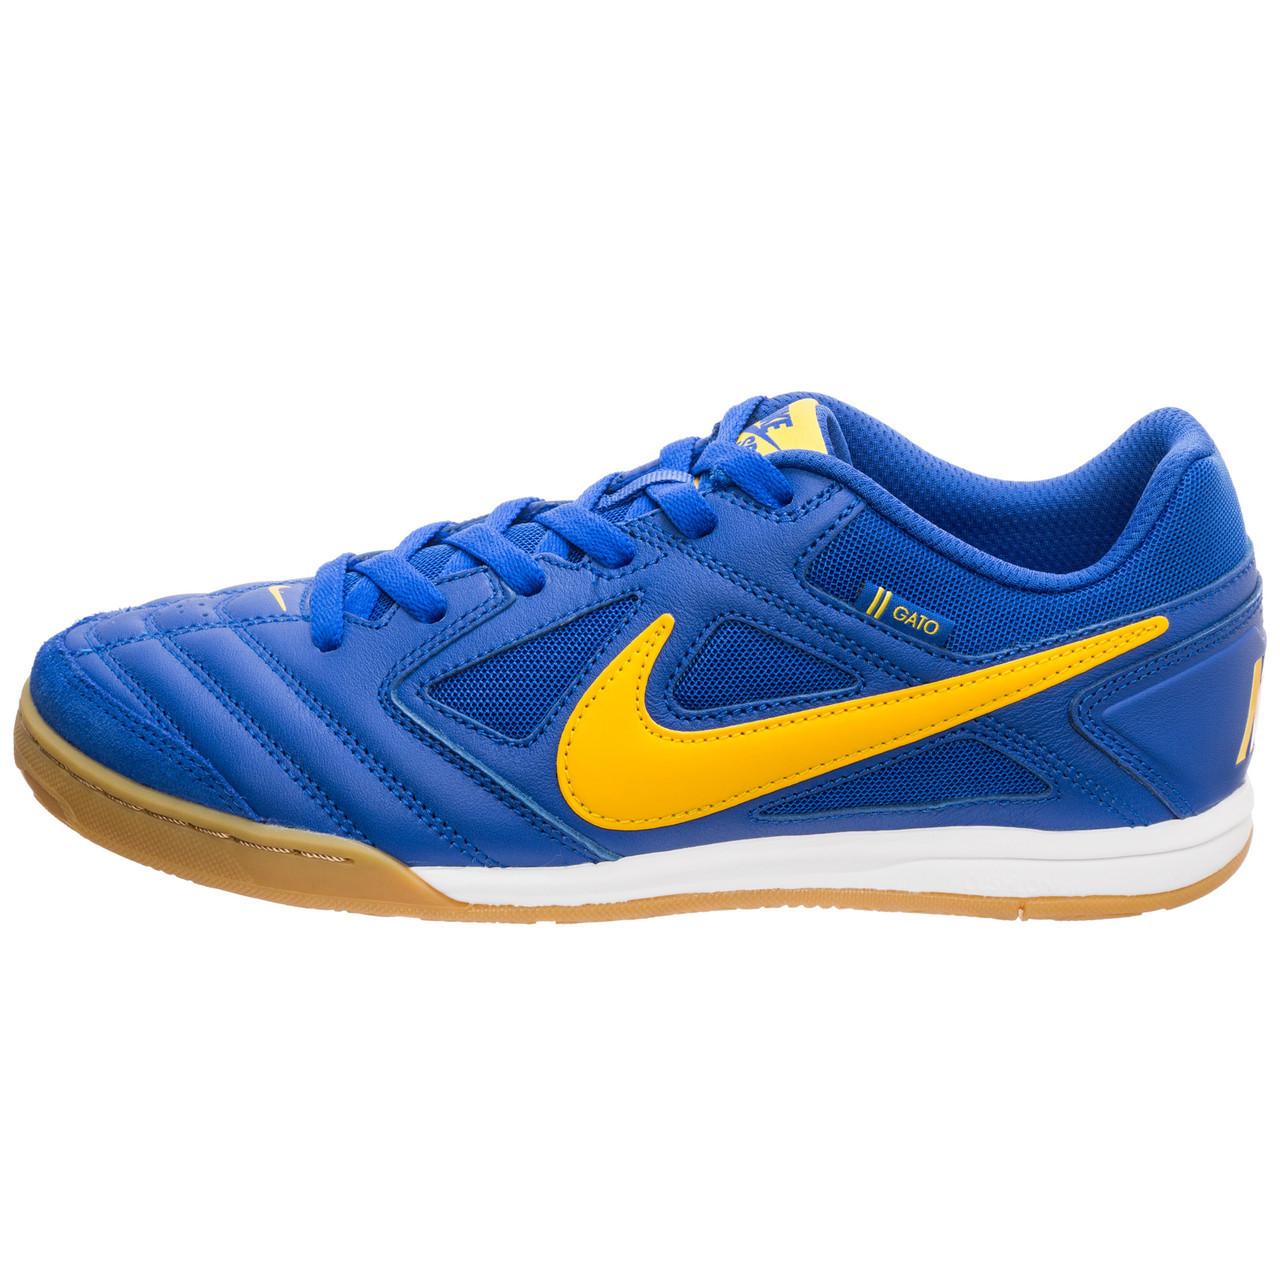 Футзалки мужские Nike SB Gato AT4607-400 - Оригинал